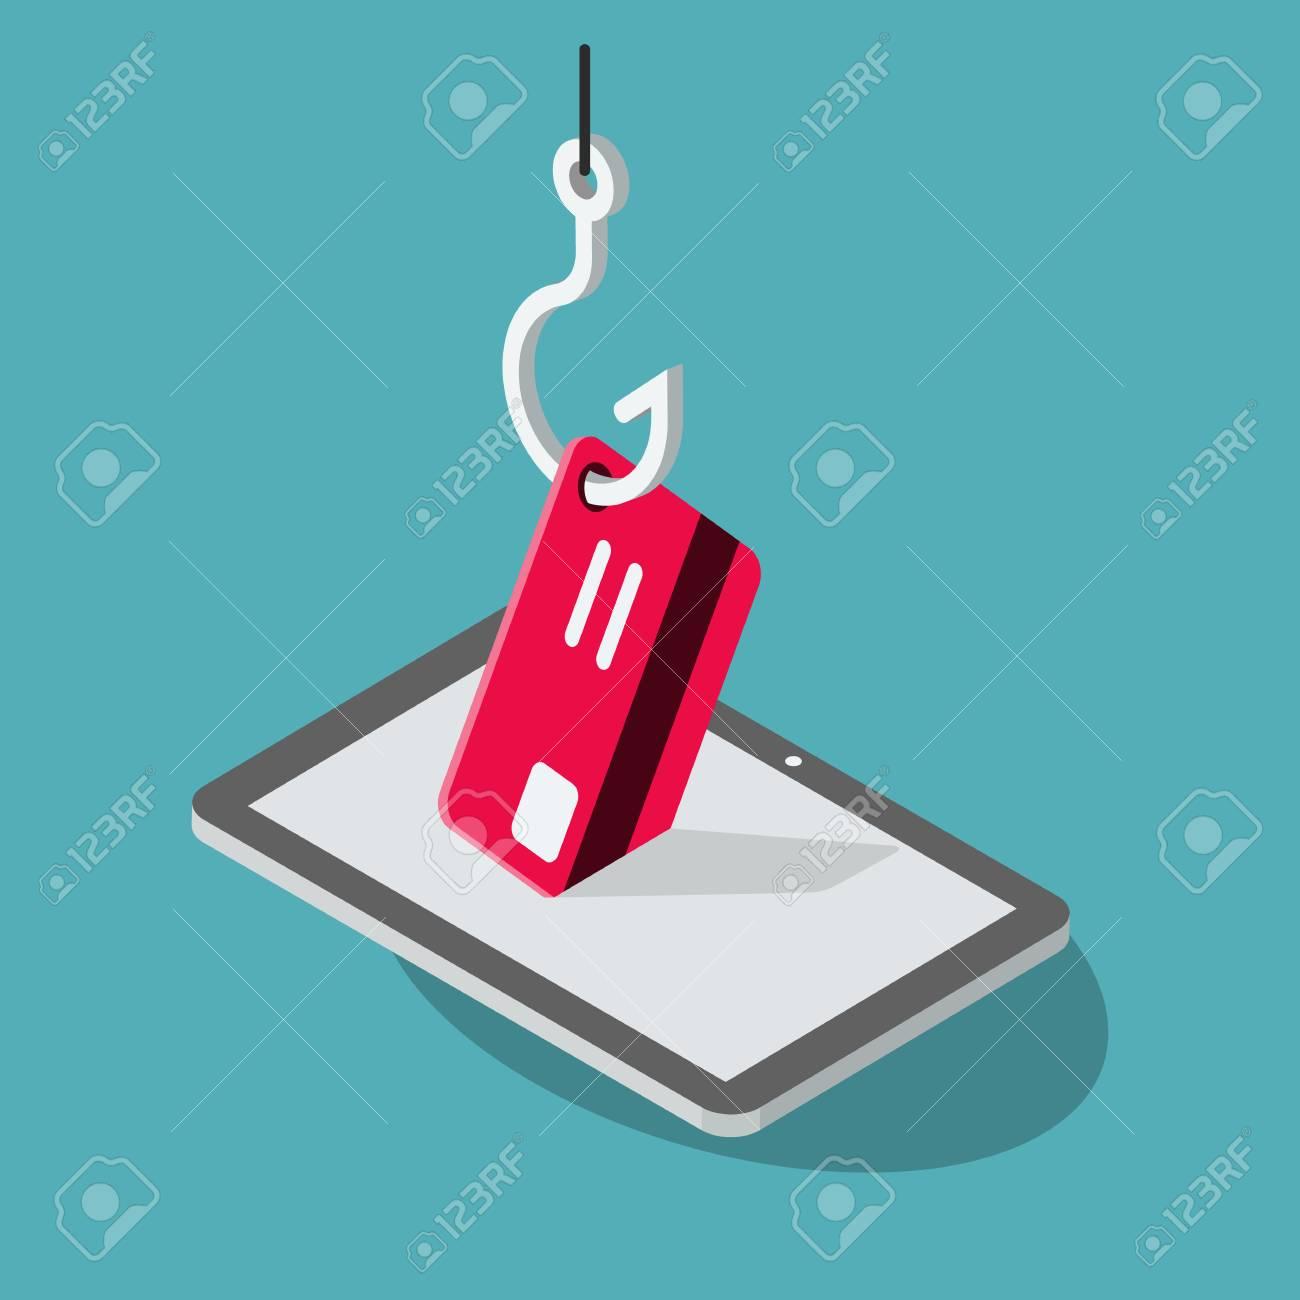 Phishing Scam isolated on white background  Flat design, easy